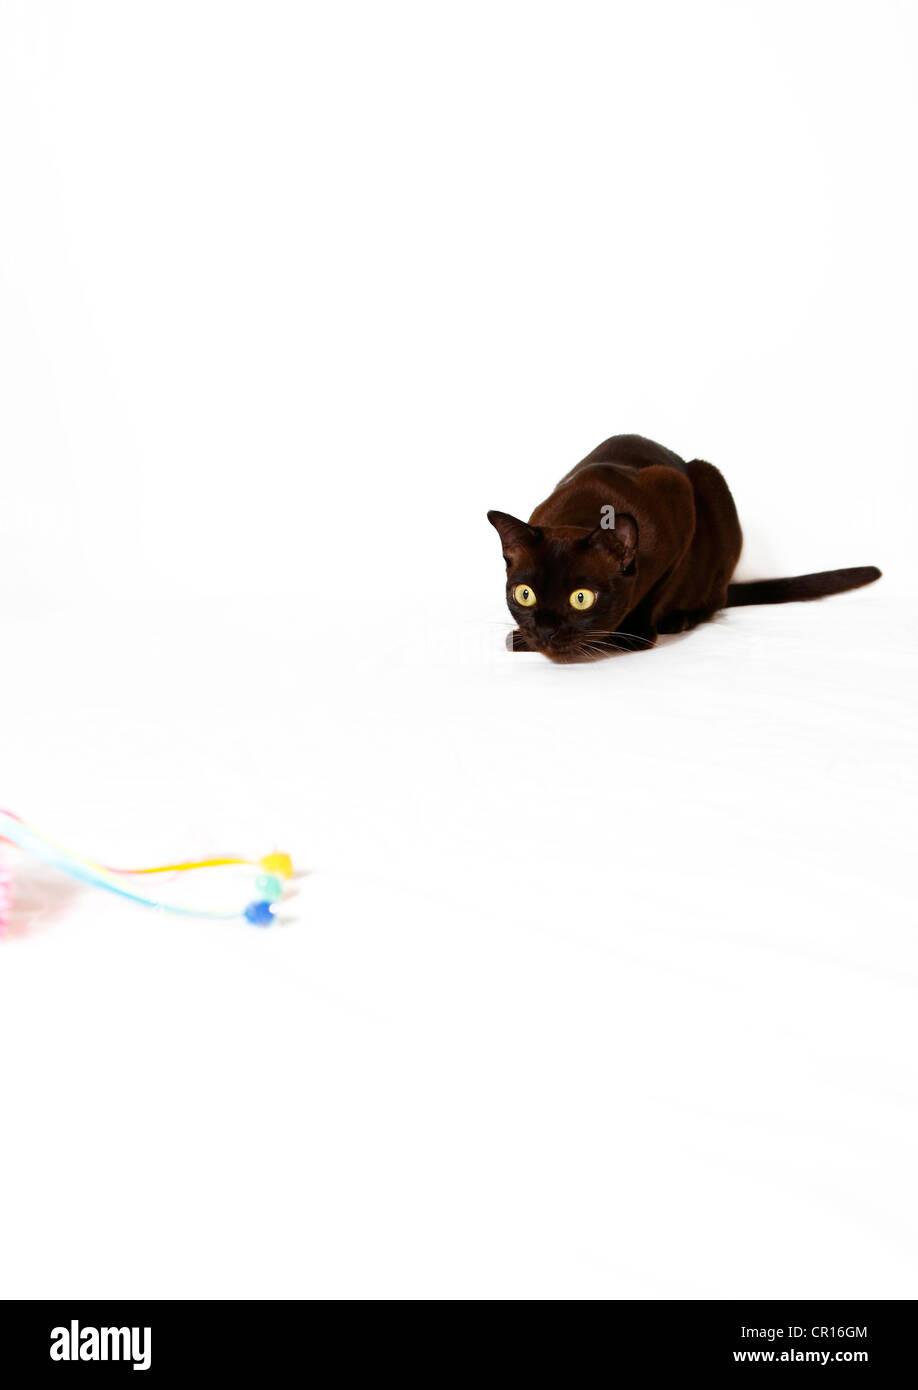 Burmese cat preying on cat toy - Stock Image